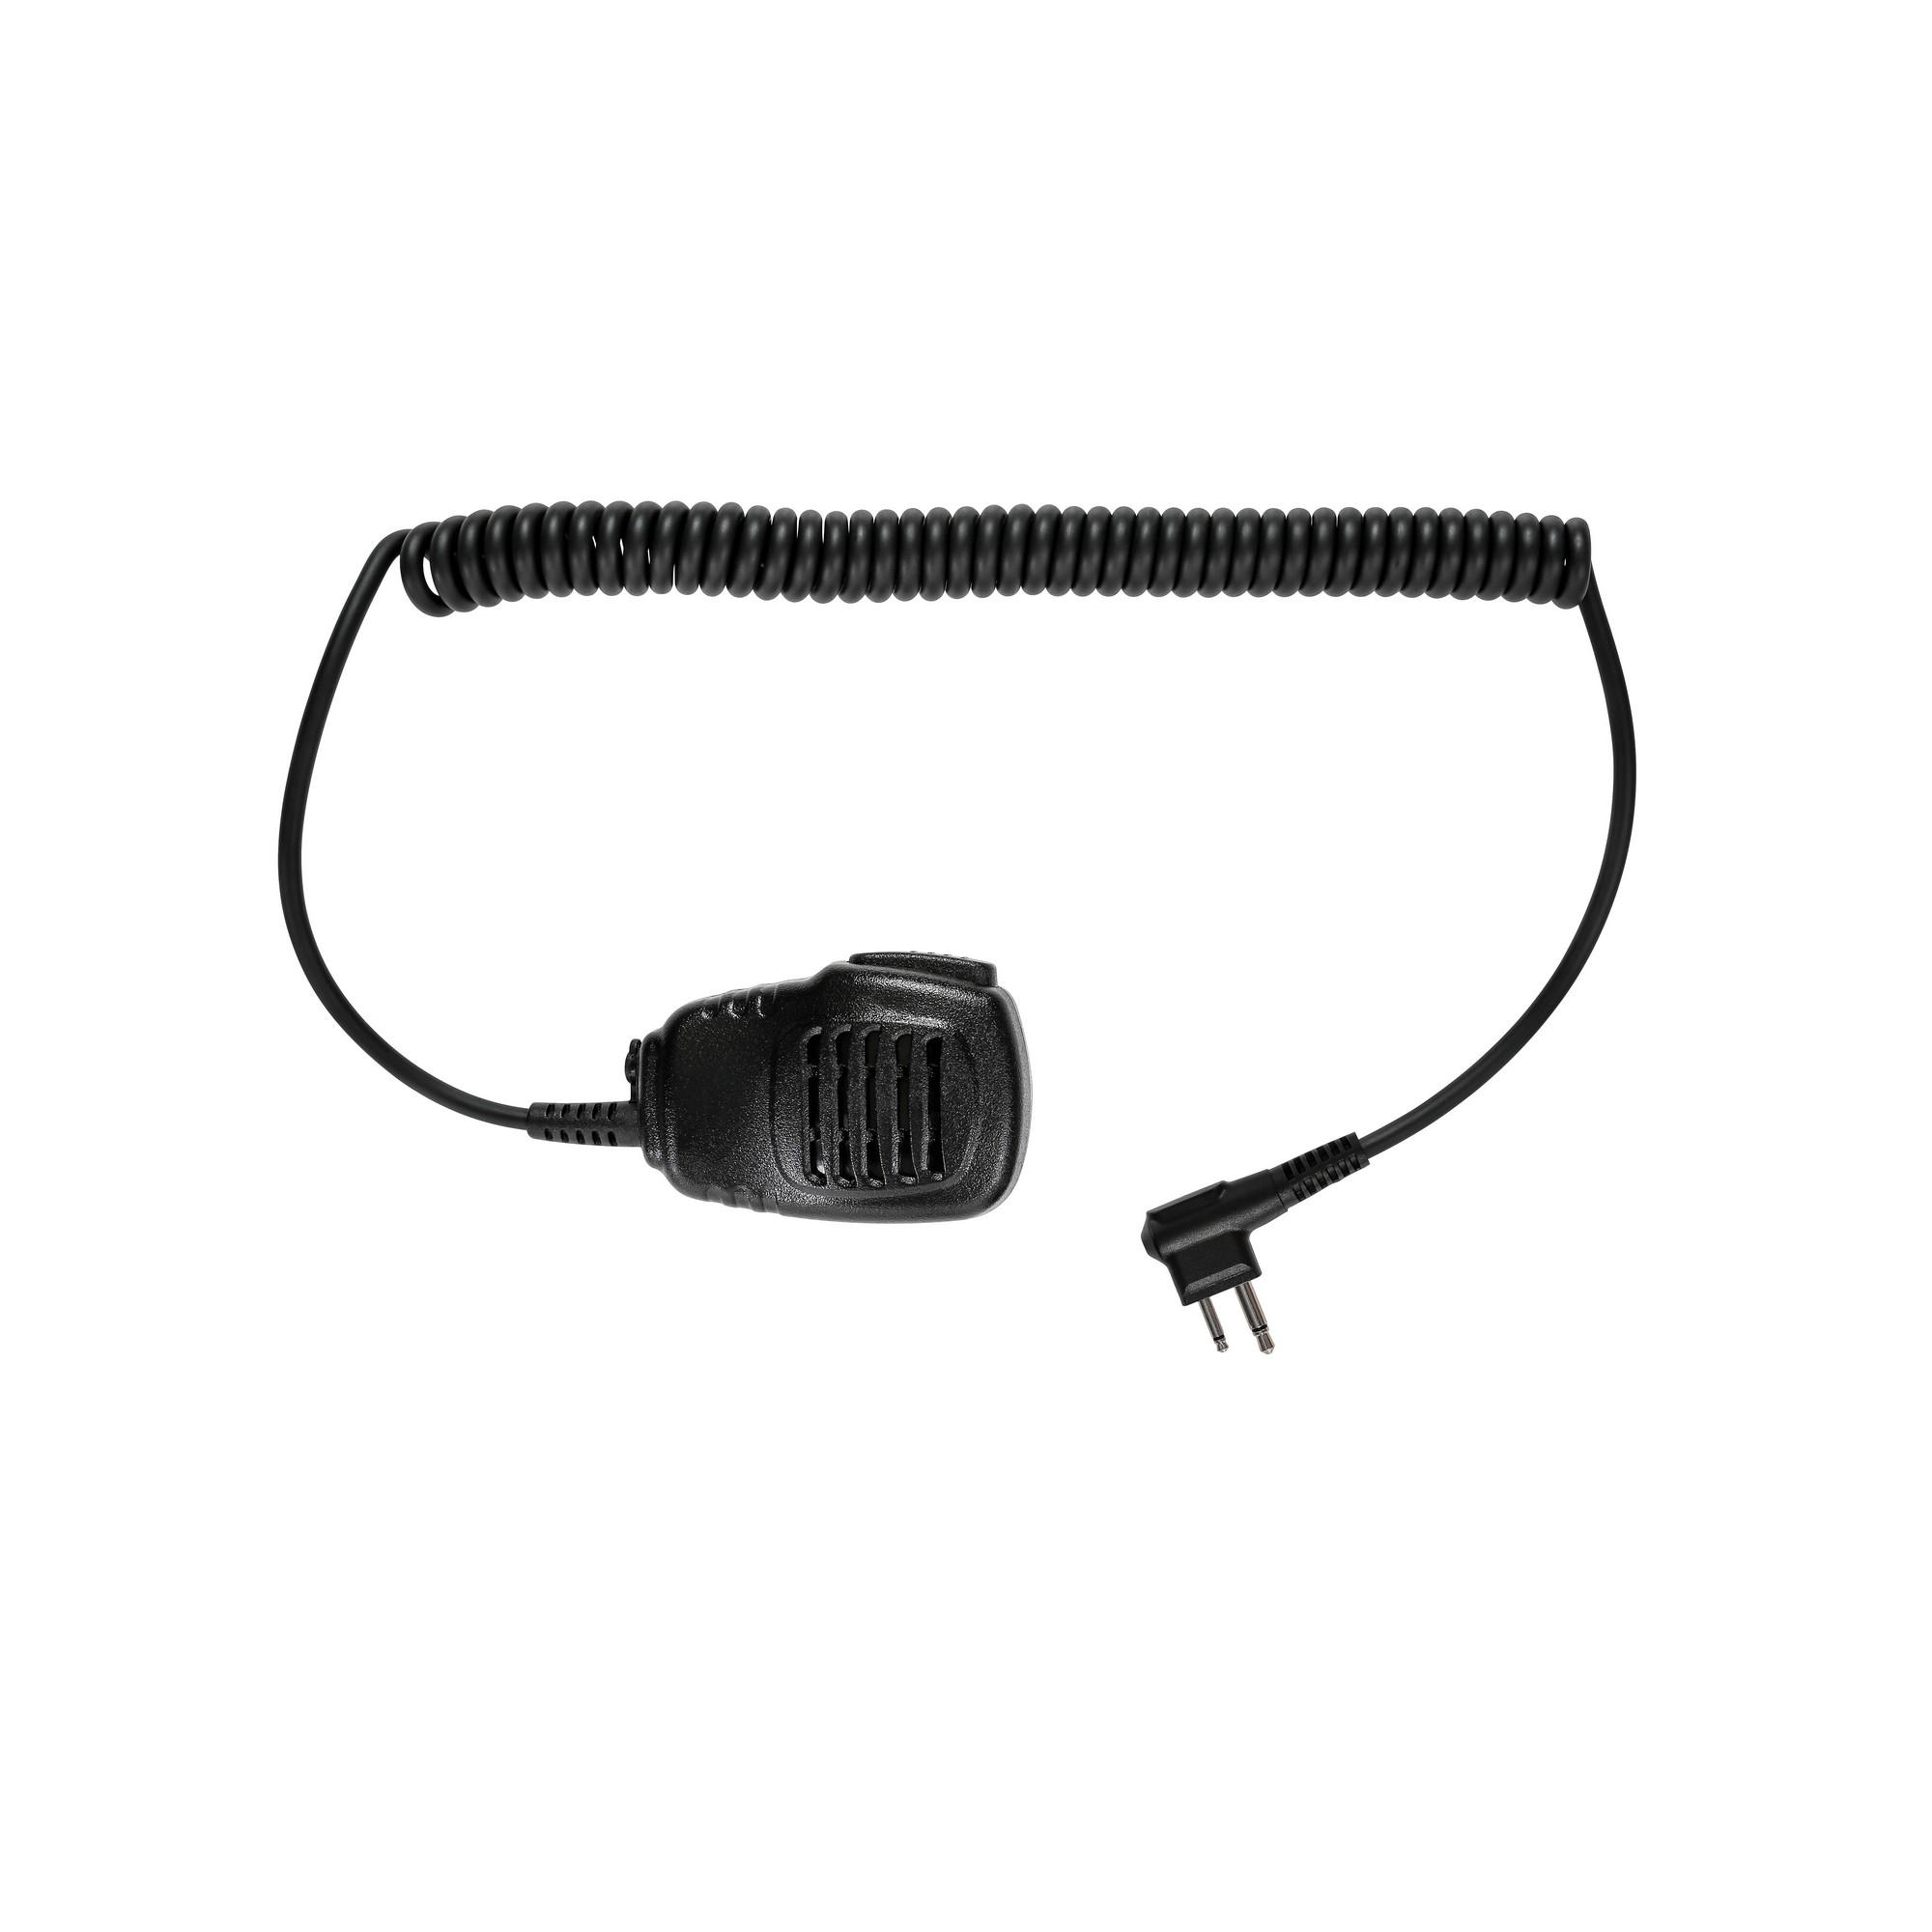 Maxtop Apm100 M1 Light Duty Shoulder Speaker Microphone